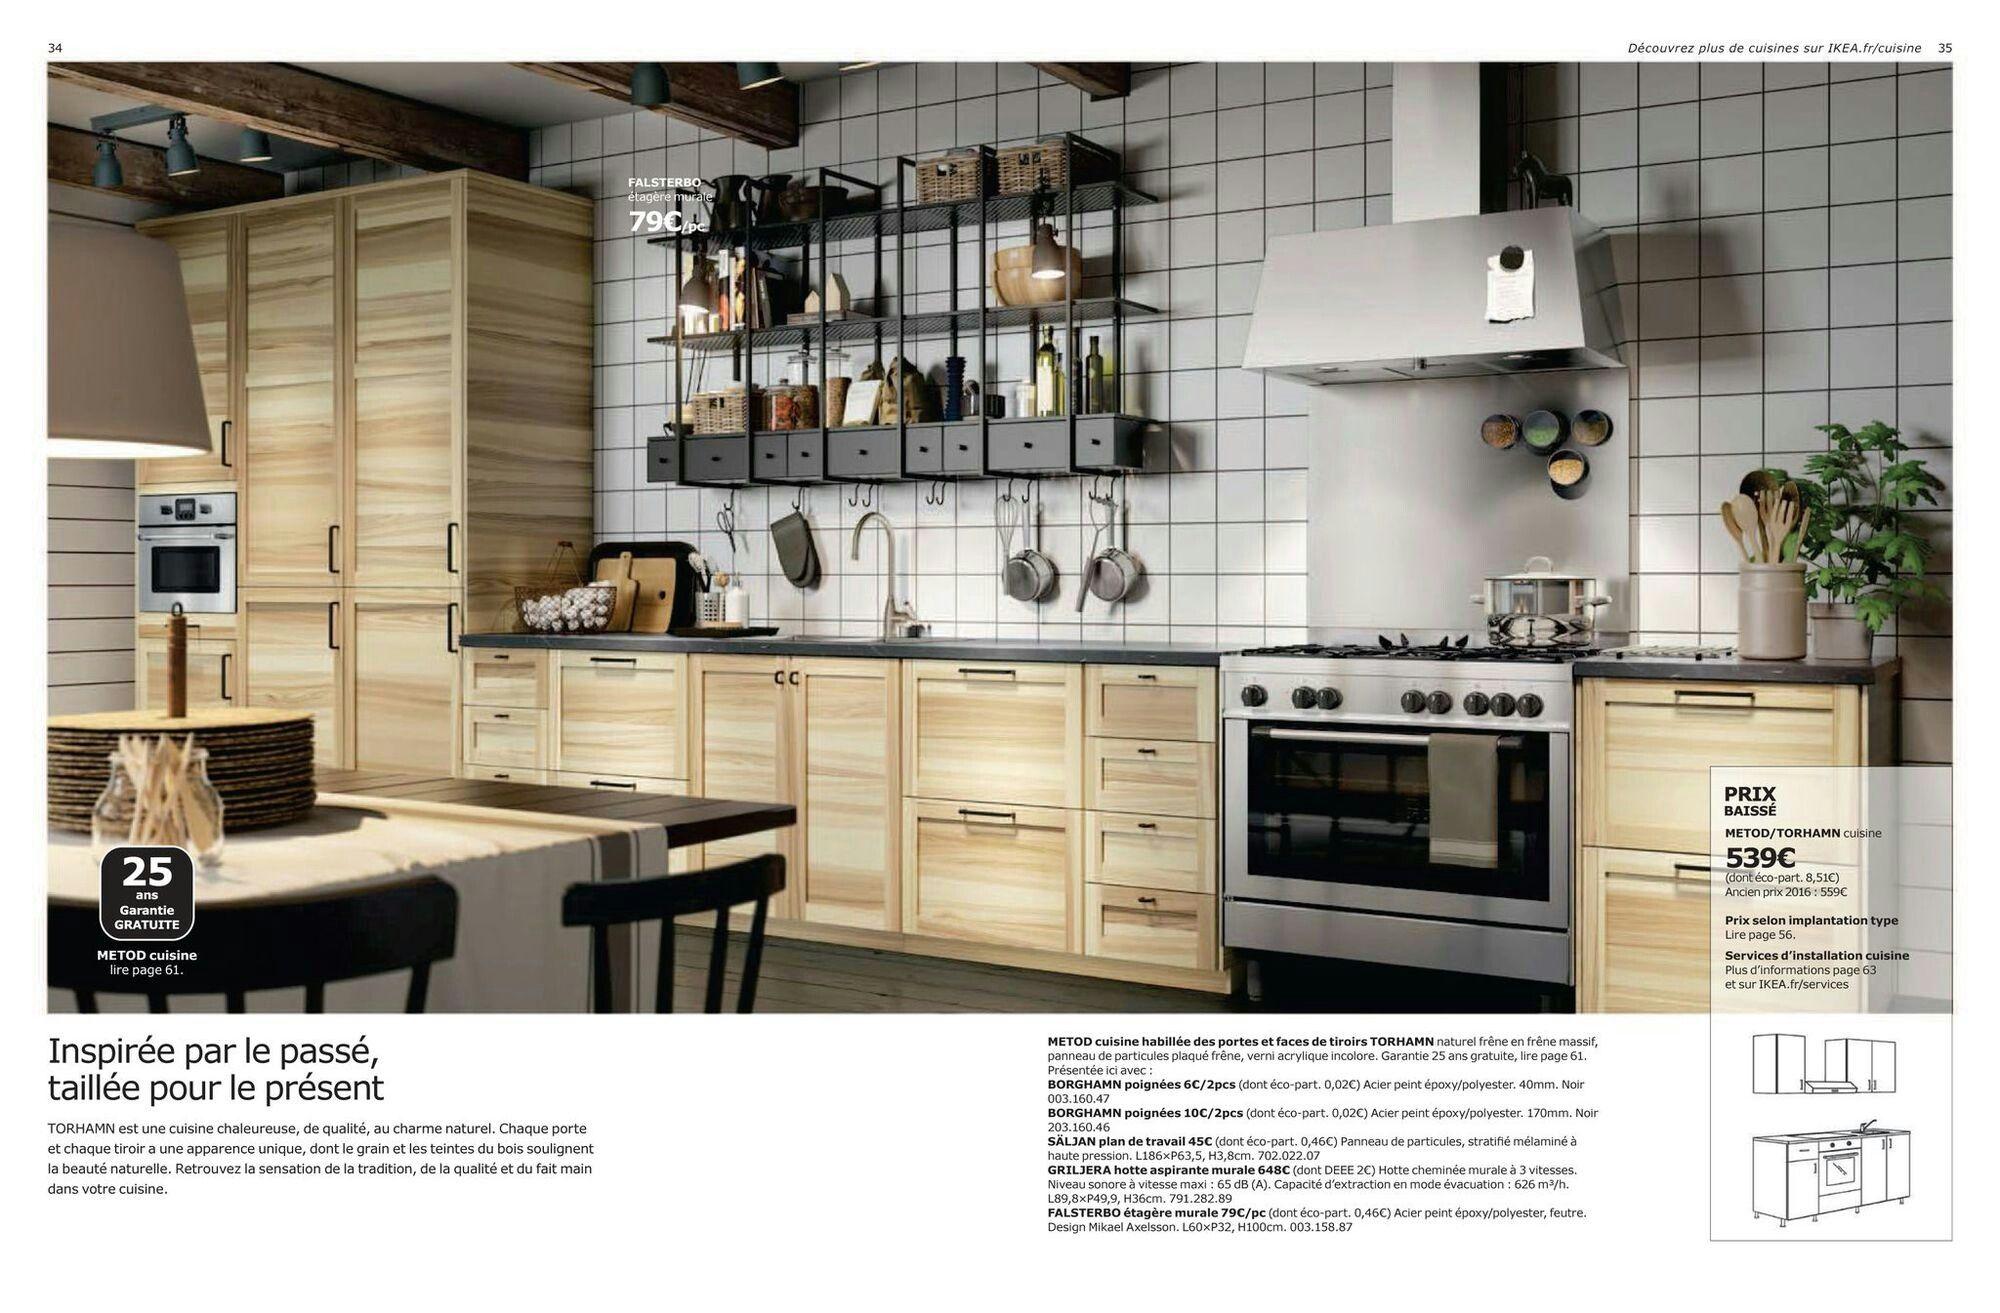 Ikea Torhamn Cuisine Ikea Home Kitchens Kitchen Design